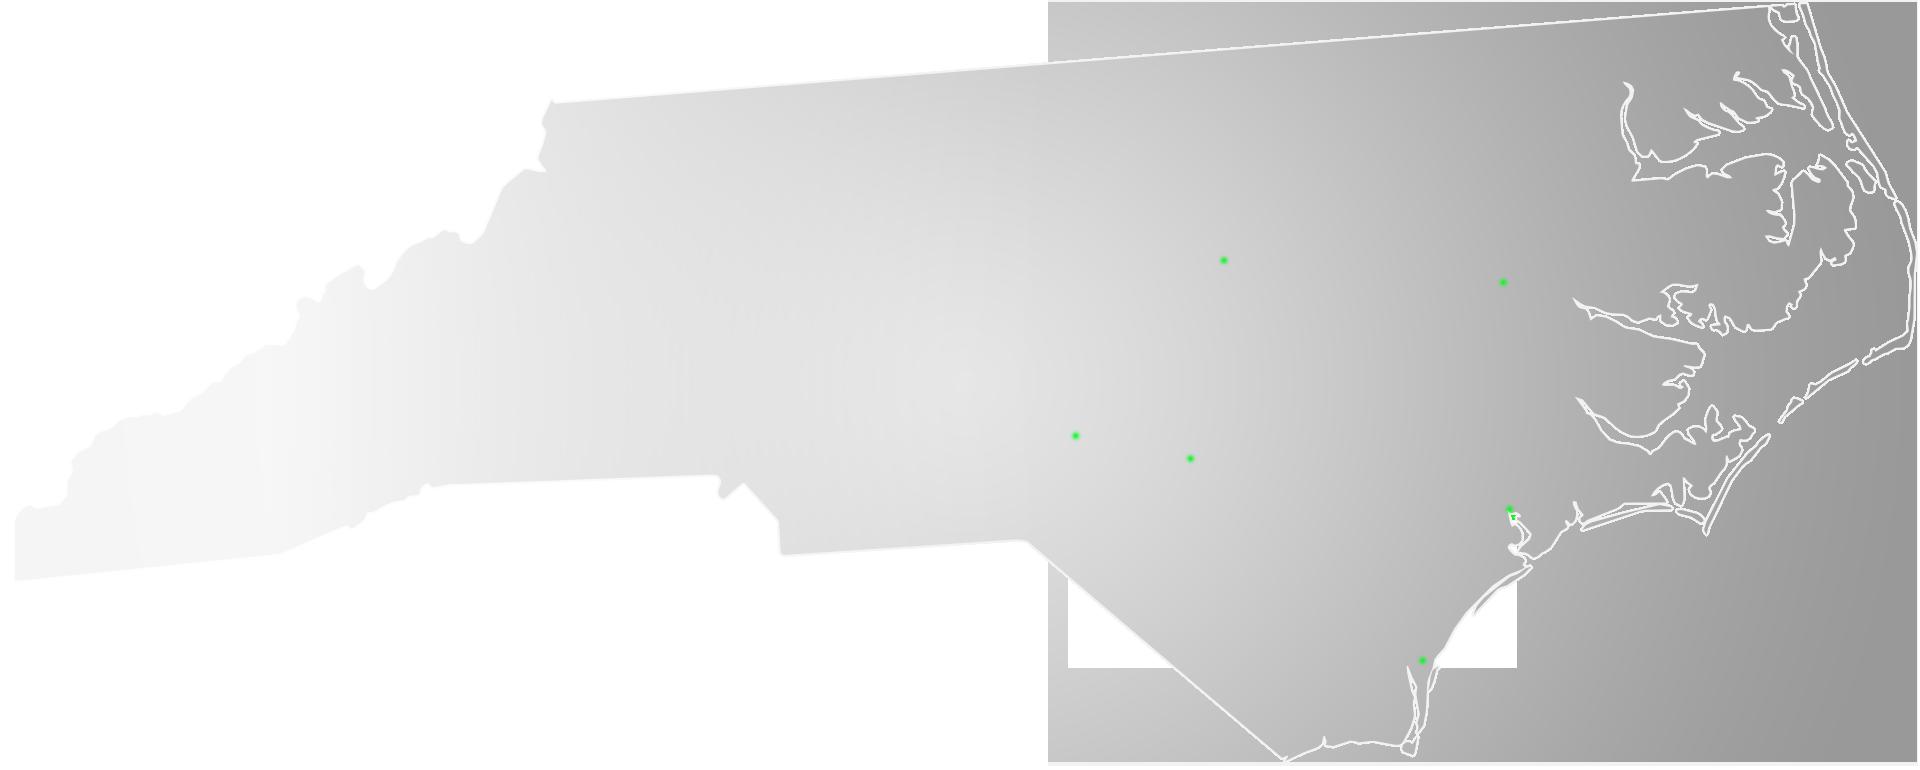 Caviness & Cates Locations